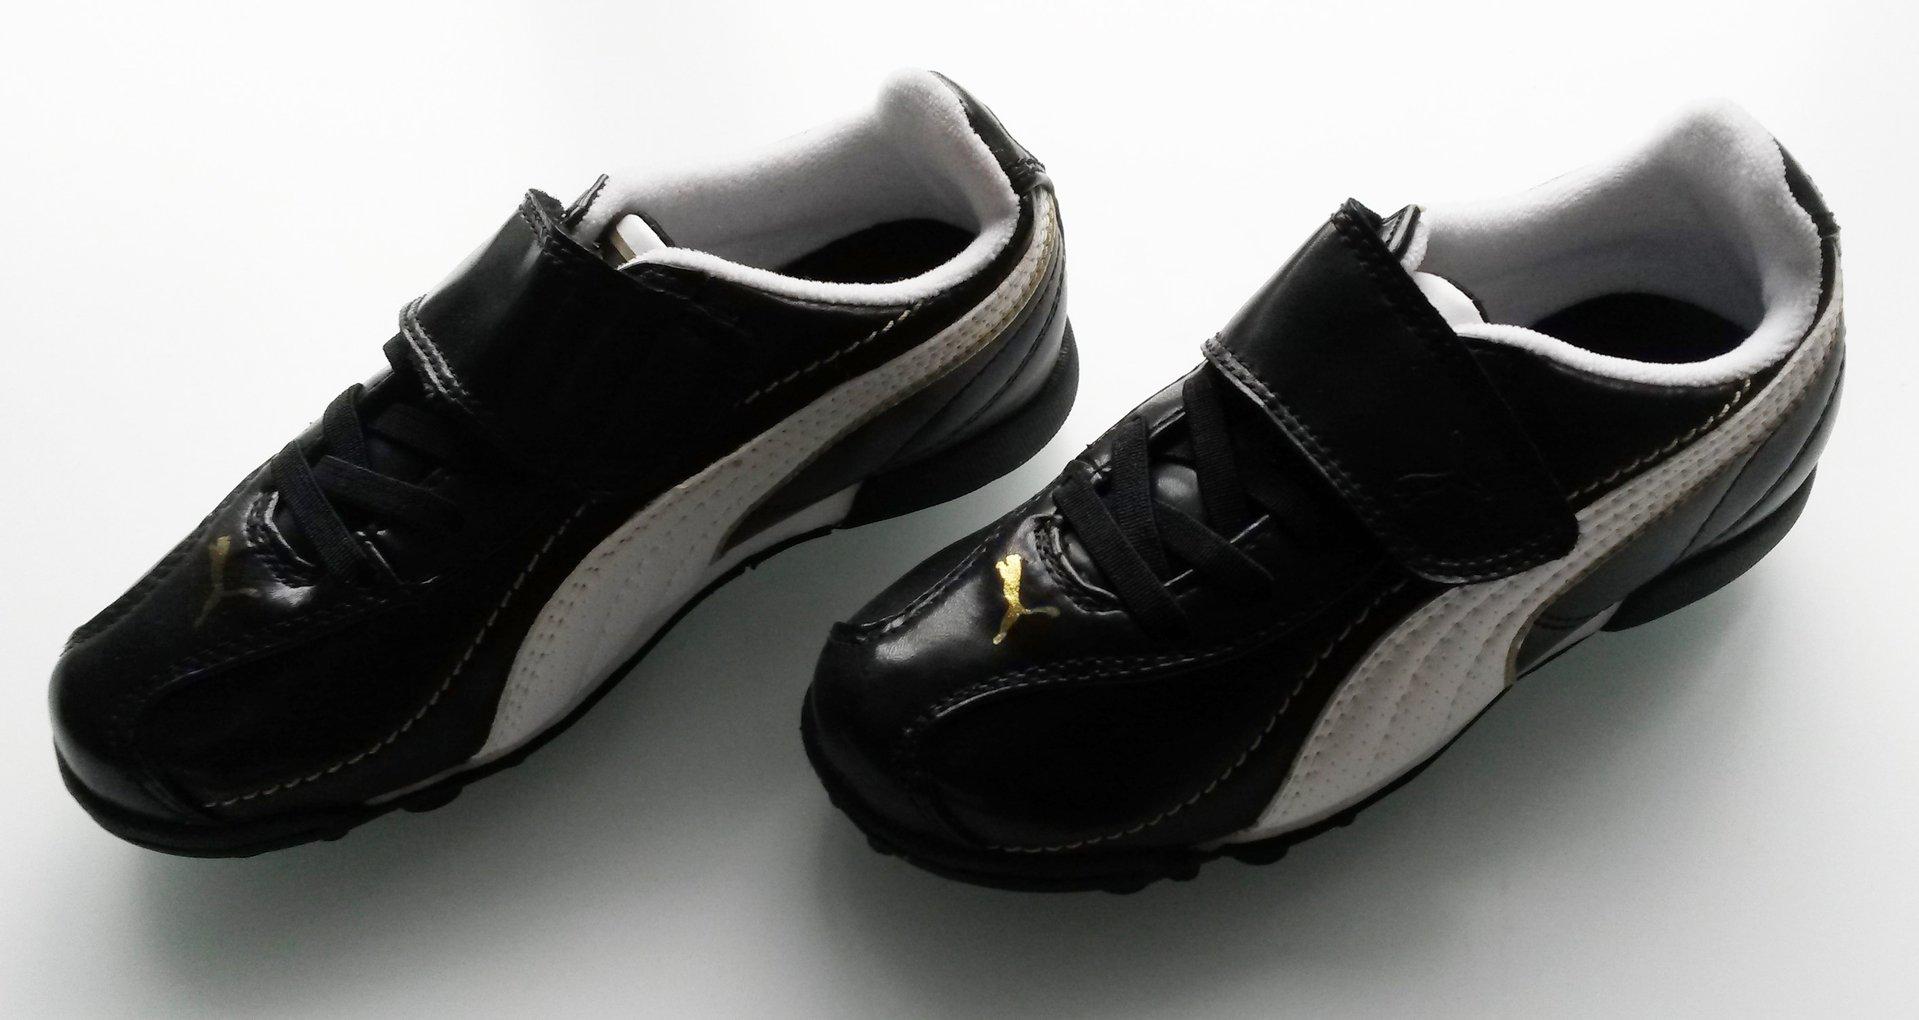 97cc97d1467498 (411) Puma Esito XL TT V JR astro football boots KIDS Size 10 BNIB